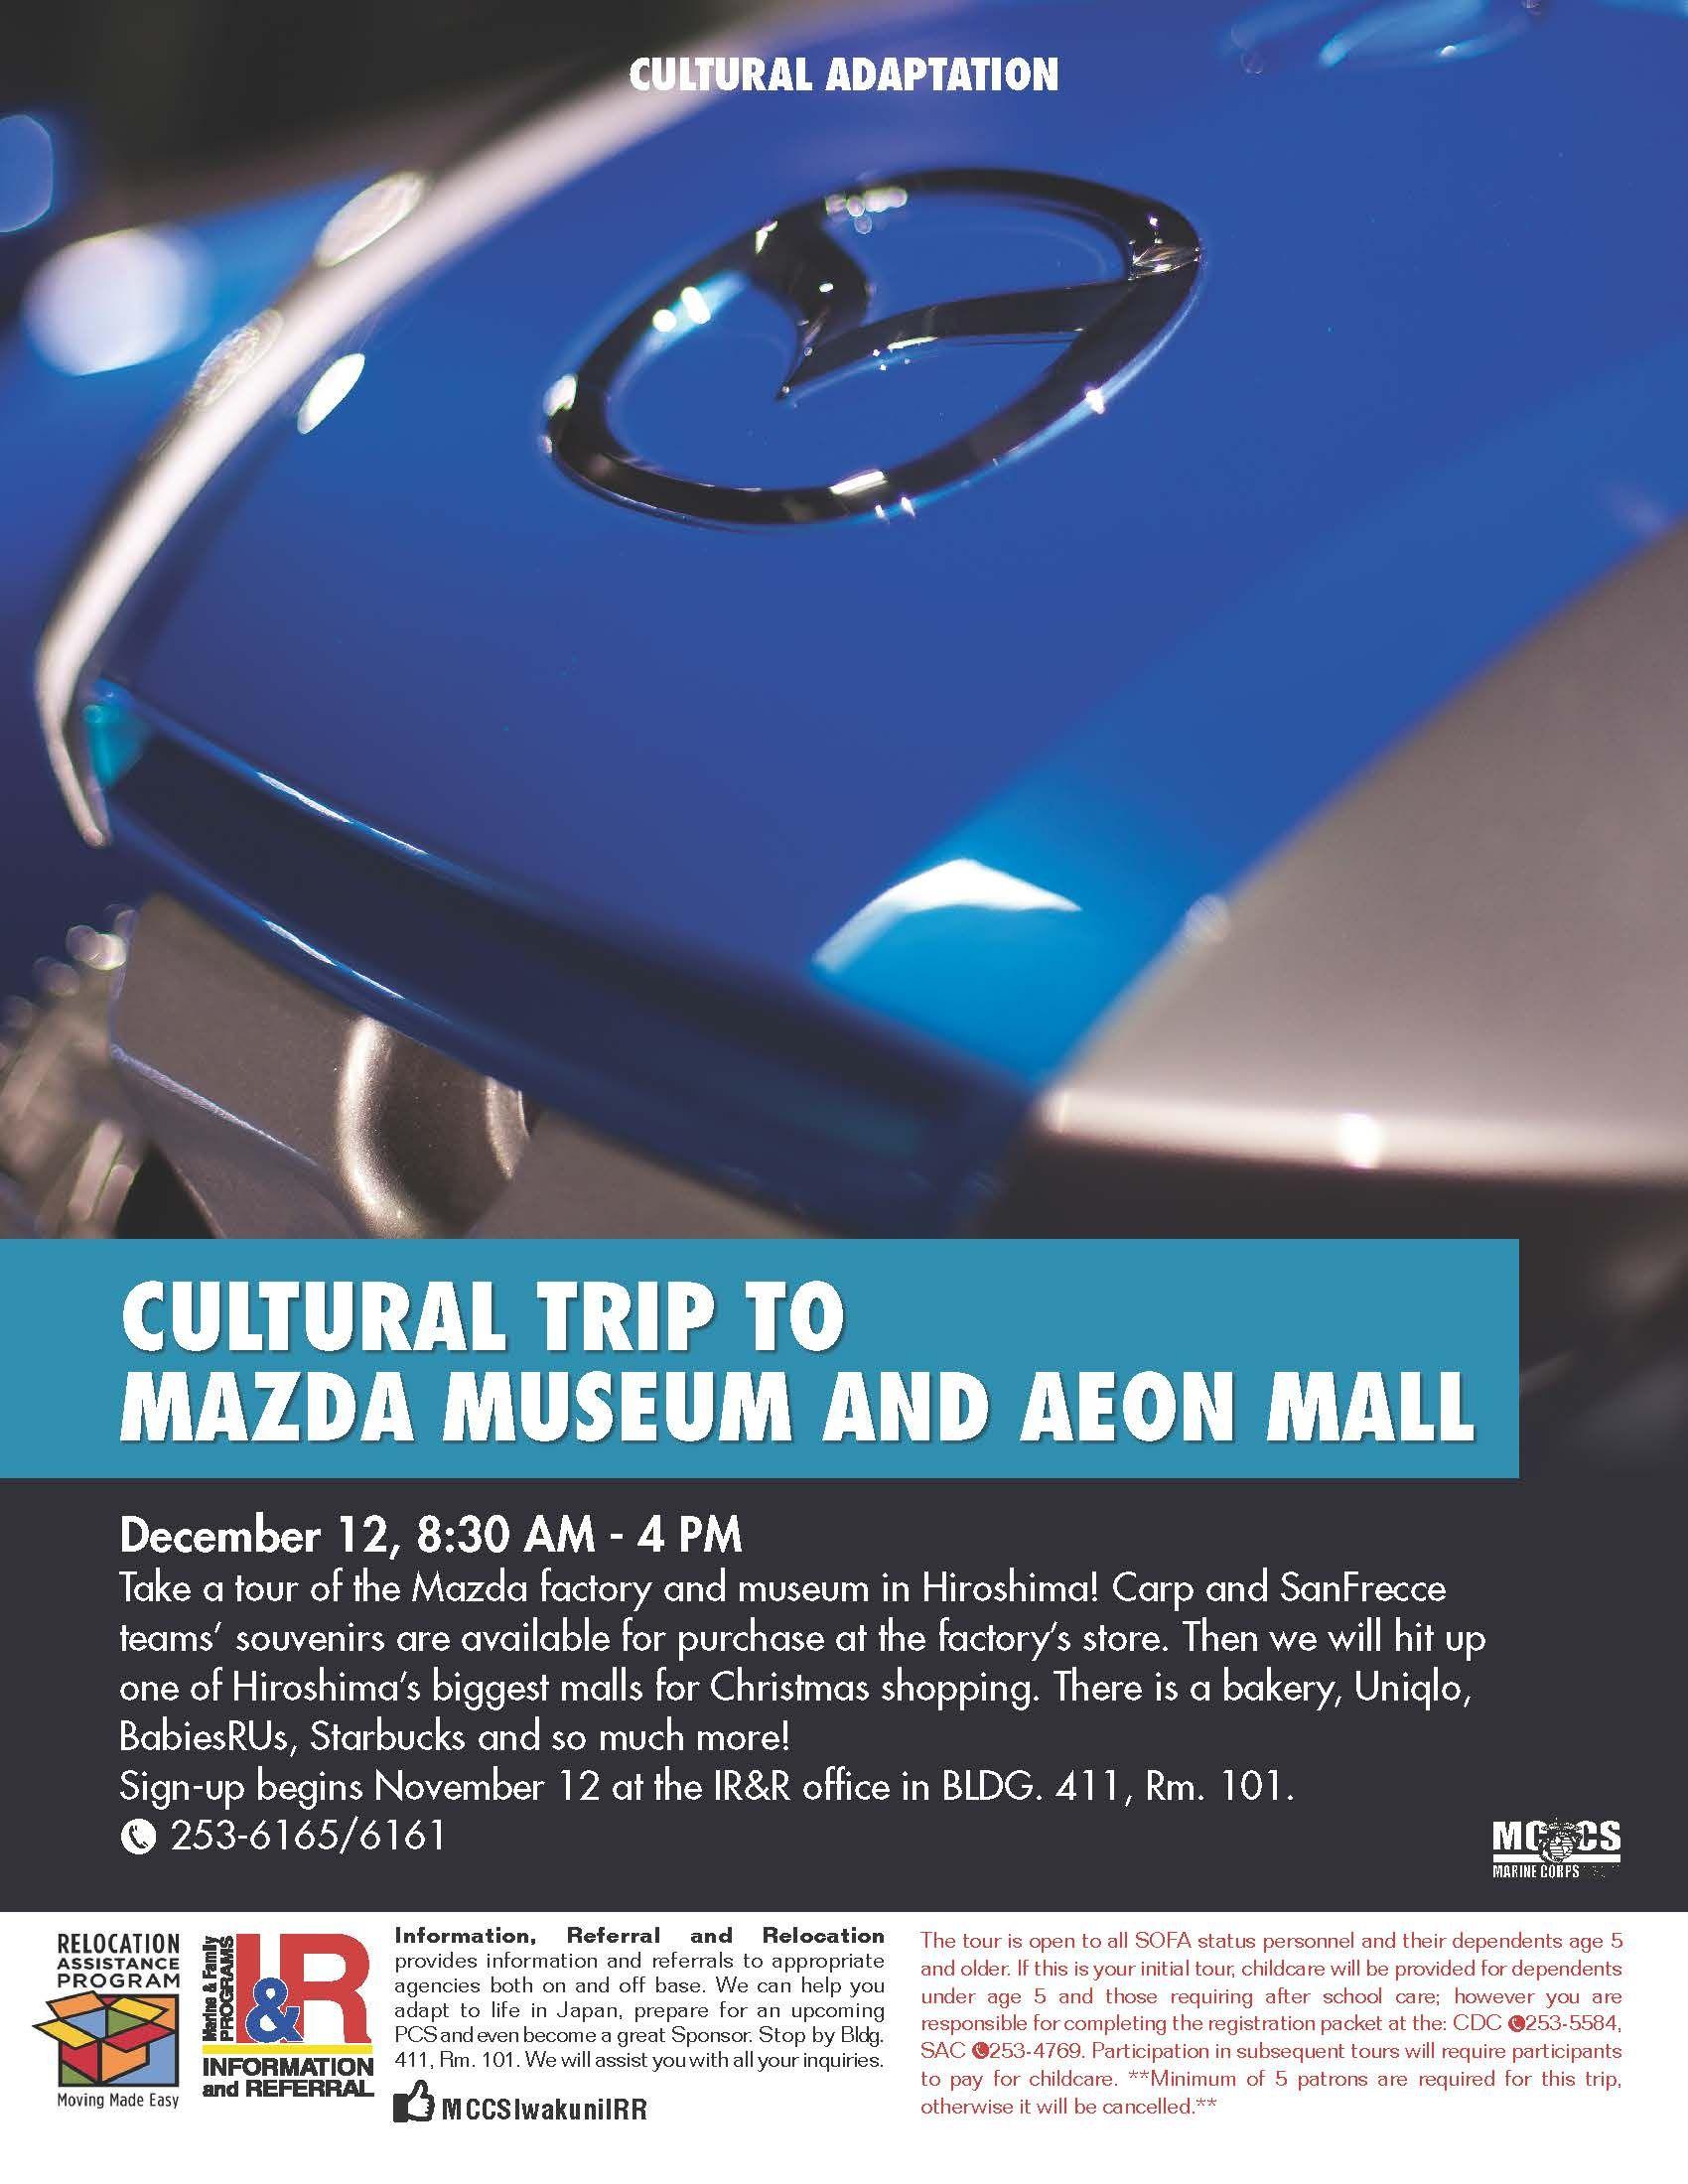 Mazda Museum and Aeon Mall Cultural Trip | MCCS Iwakuni